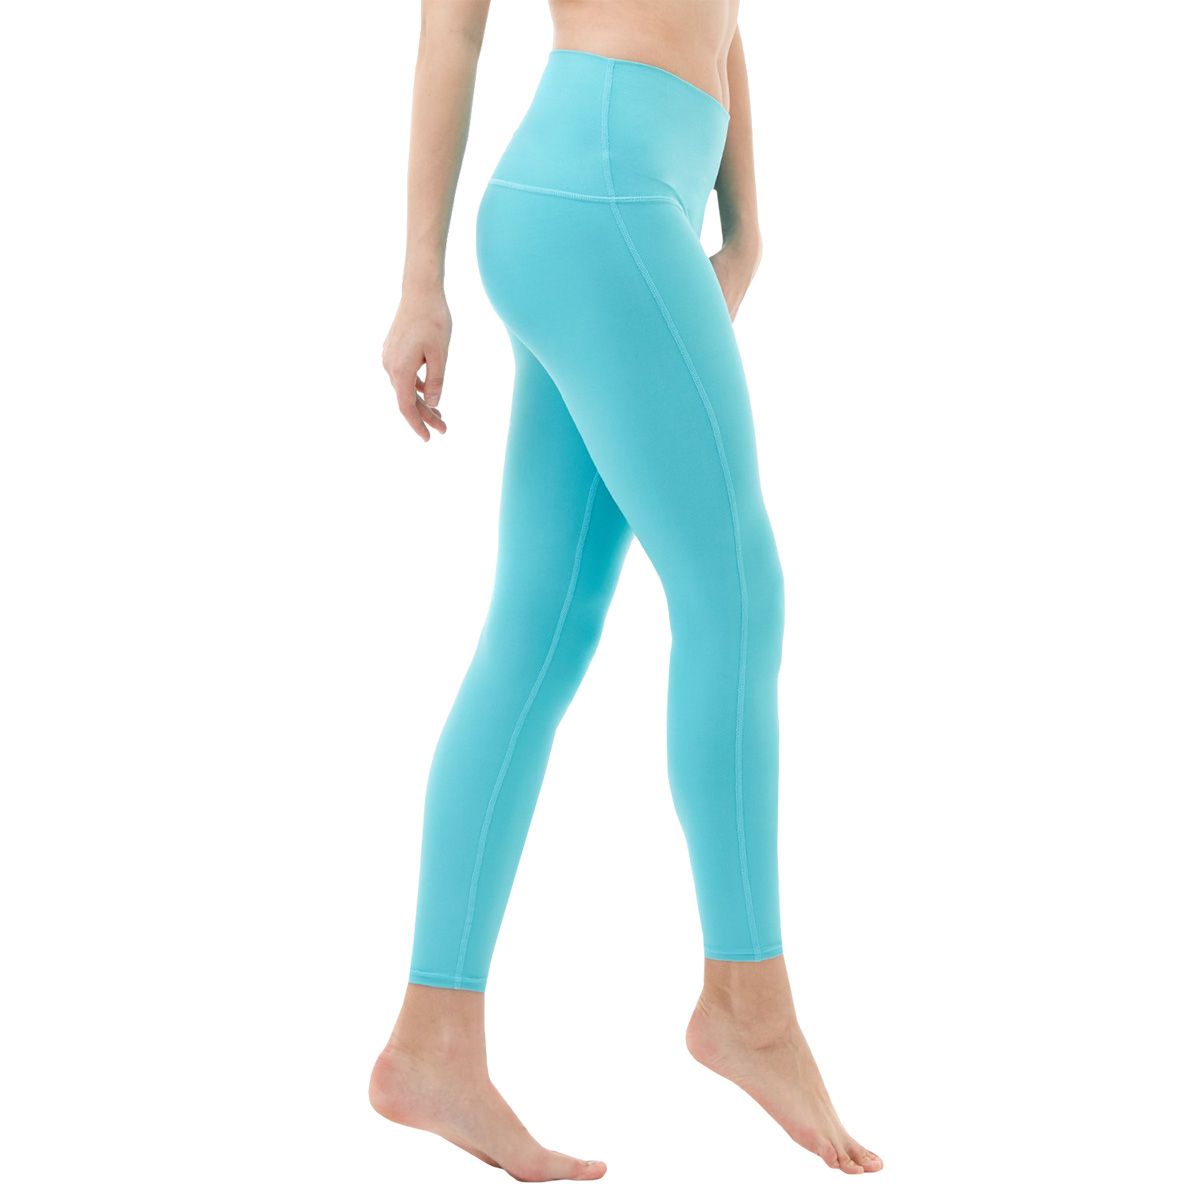 thumbnail 4 - TSLA Tesla FYP42 Women's High-Waisted Ultra-Stretch Tummy Control Yoga Pants